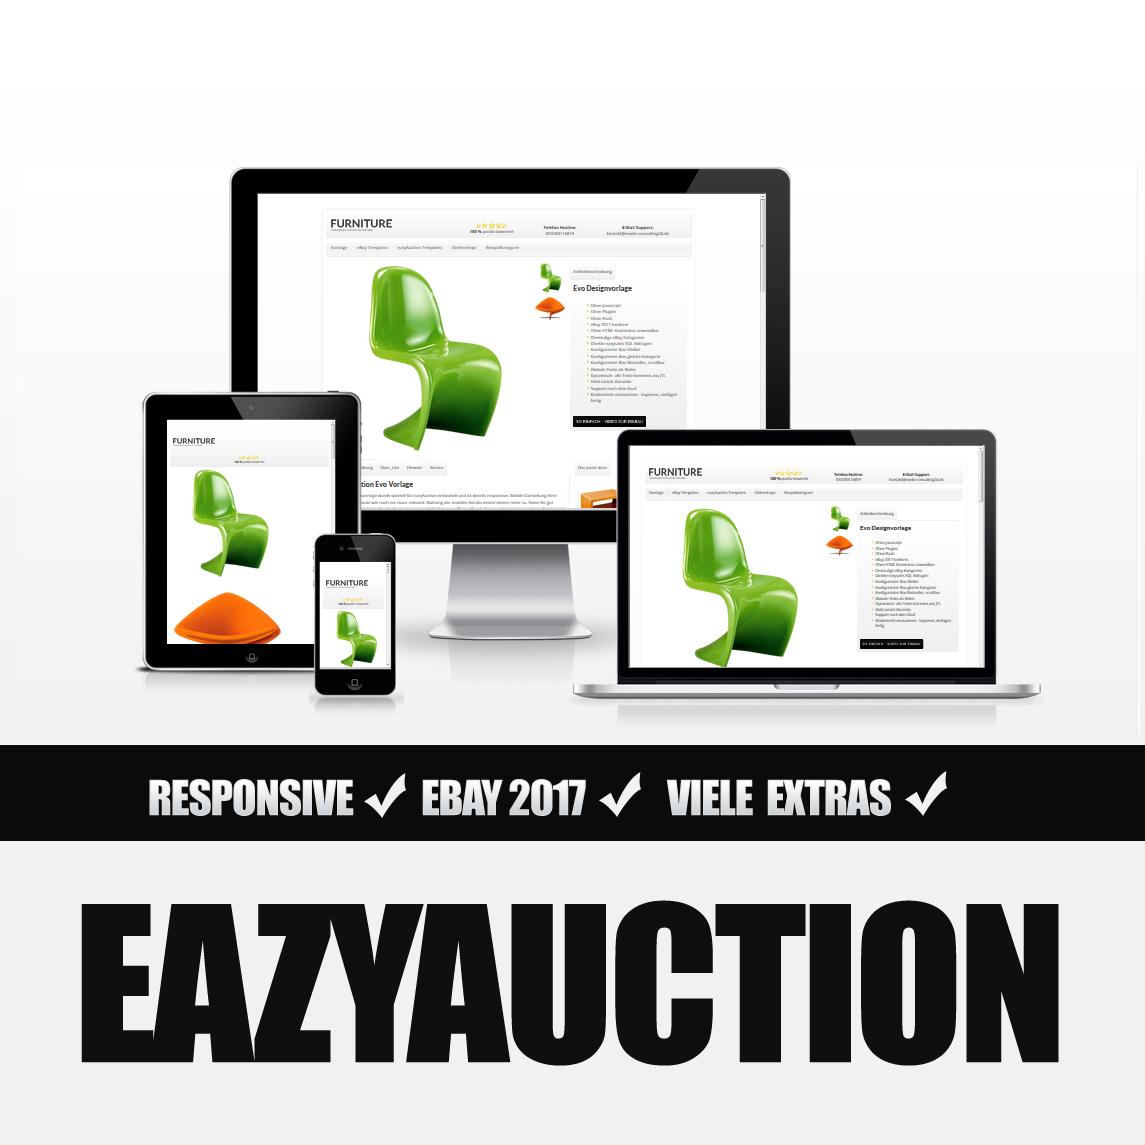 Eazyauction eBay Template 2017 #2-2